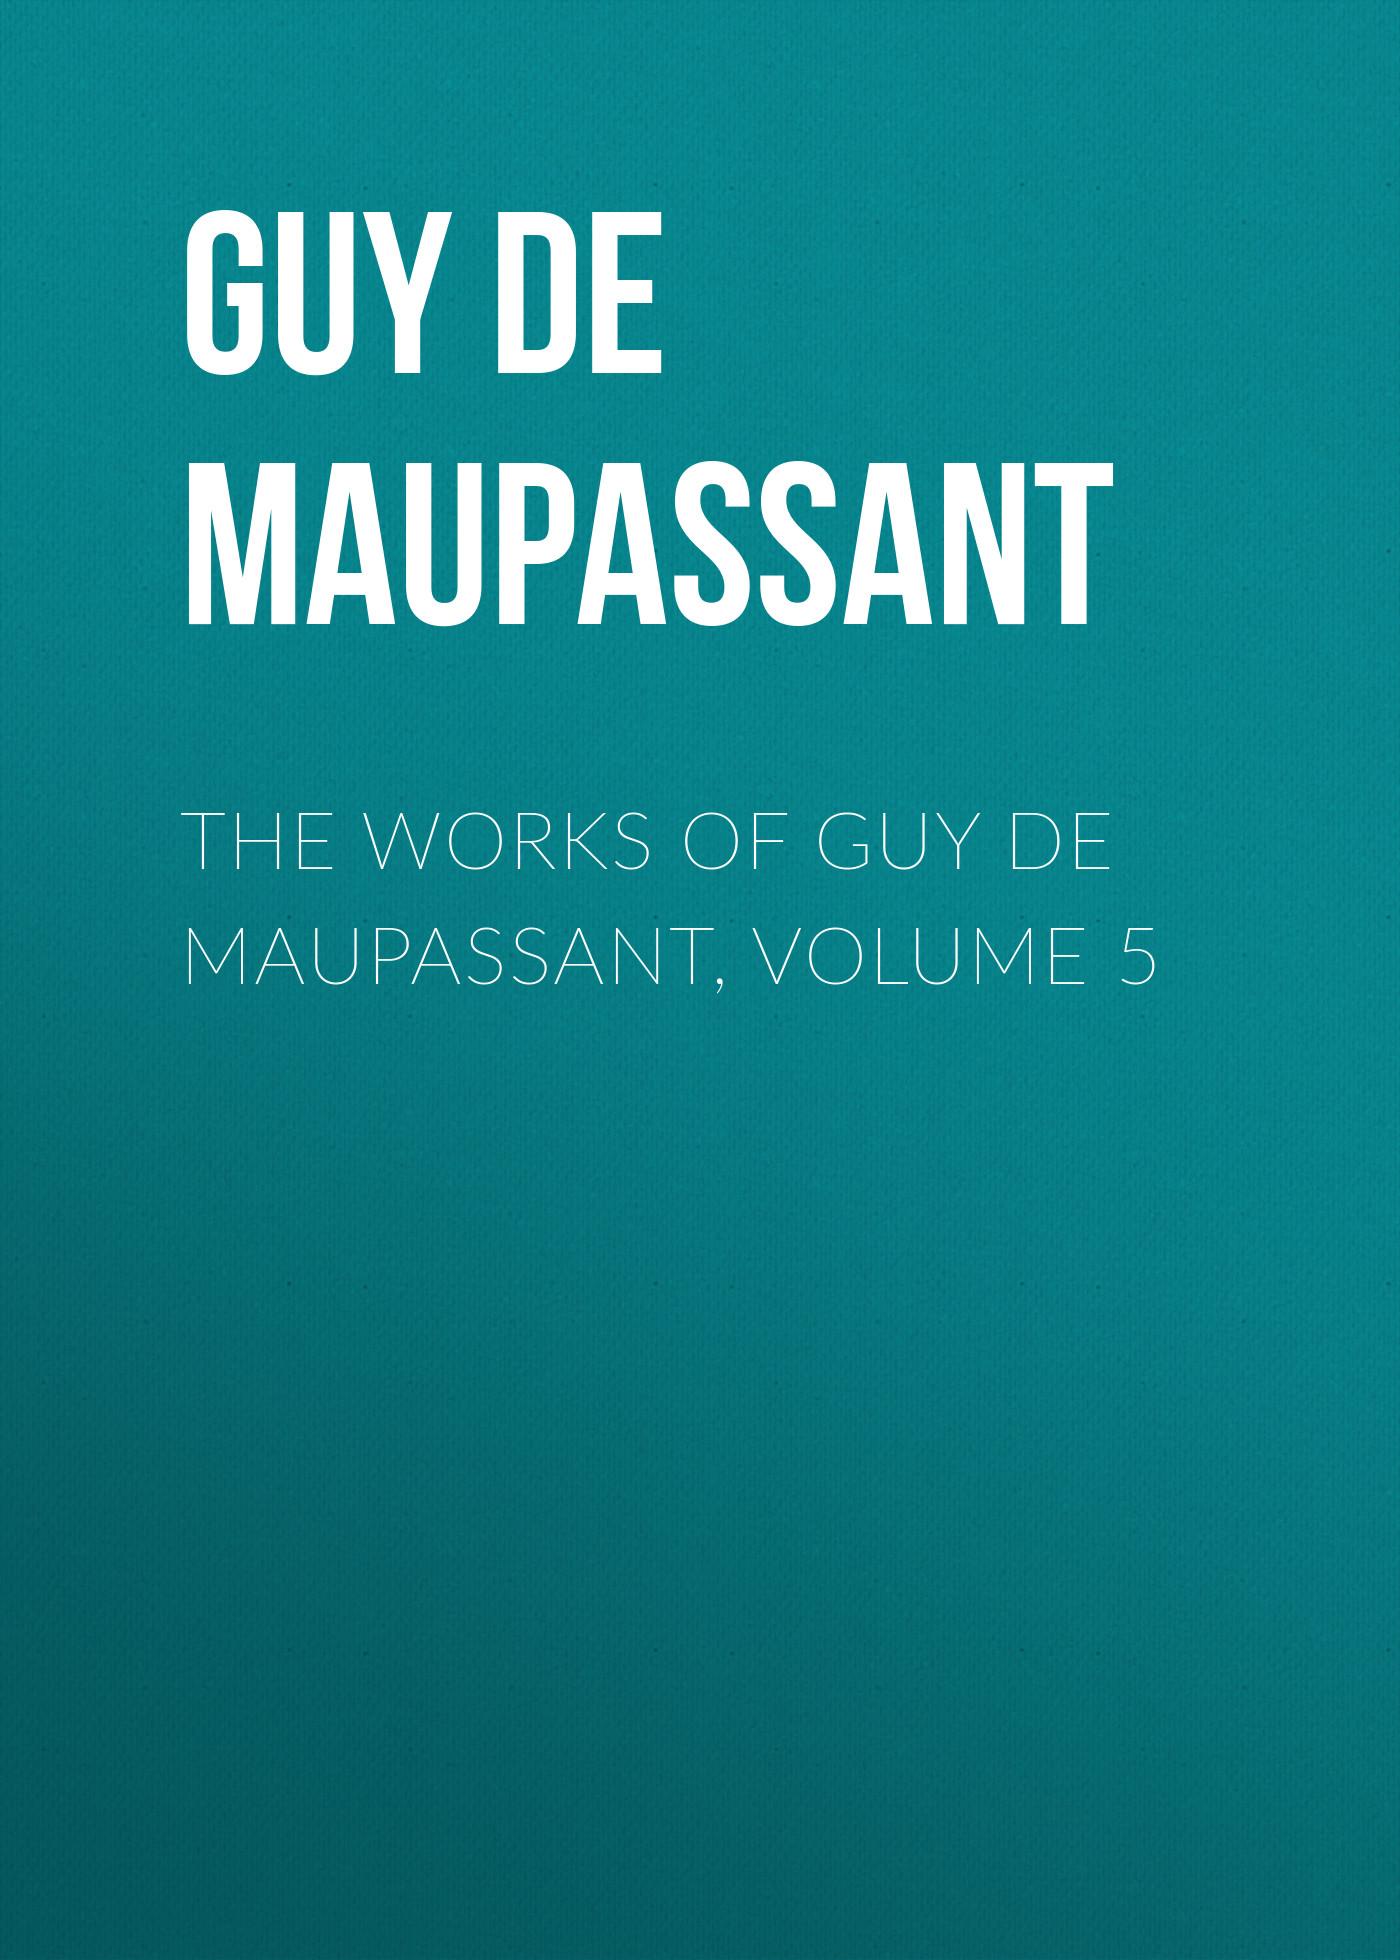 Ги де Мопассан The works of Guy de Maupassant, Volume 5 ги де мопассан œuvres complètes de guy de maupassant volume 03